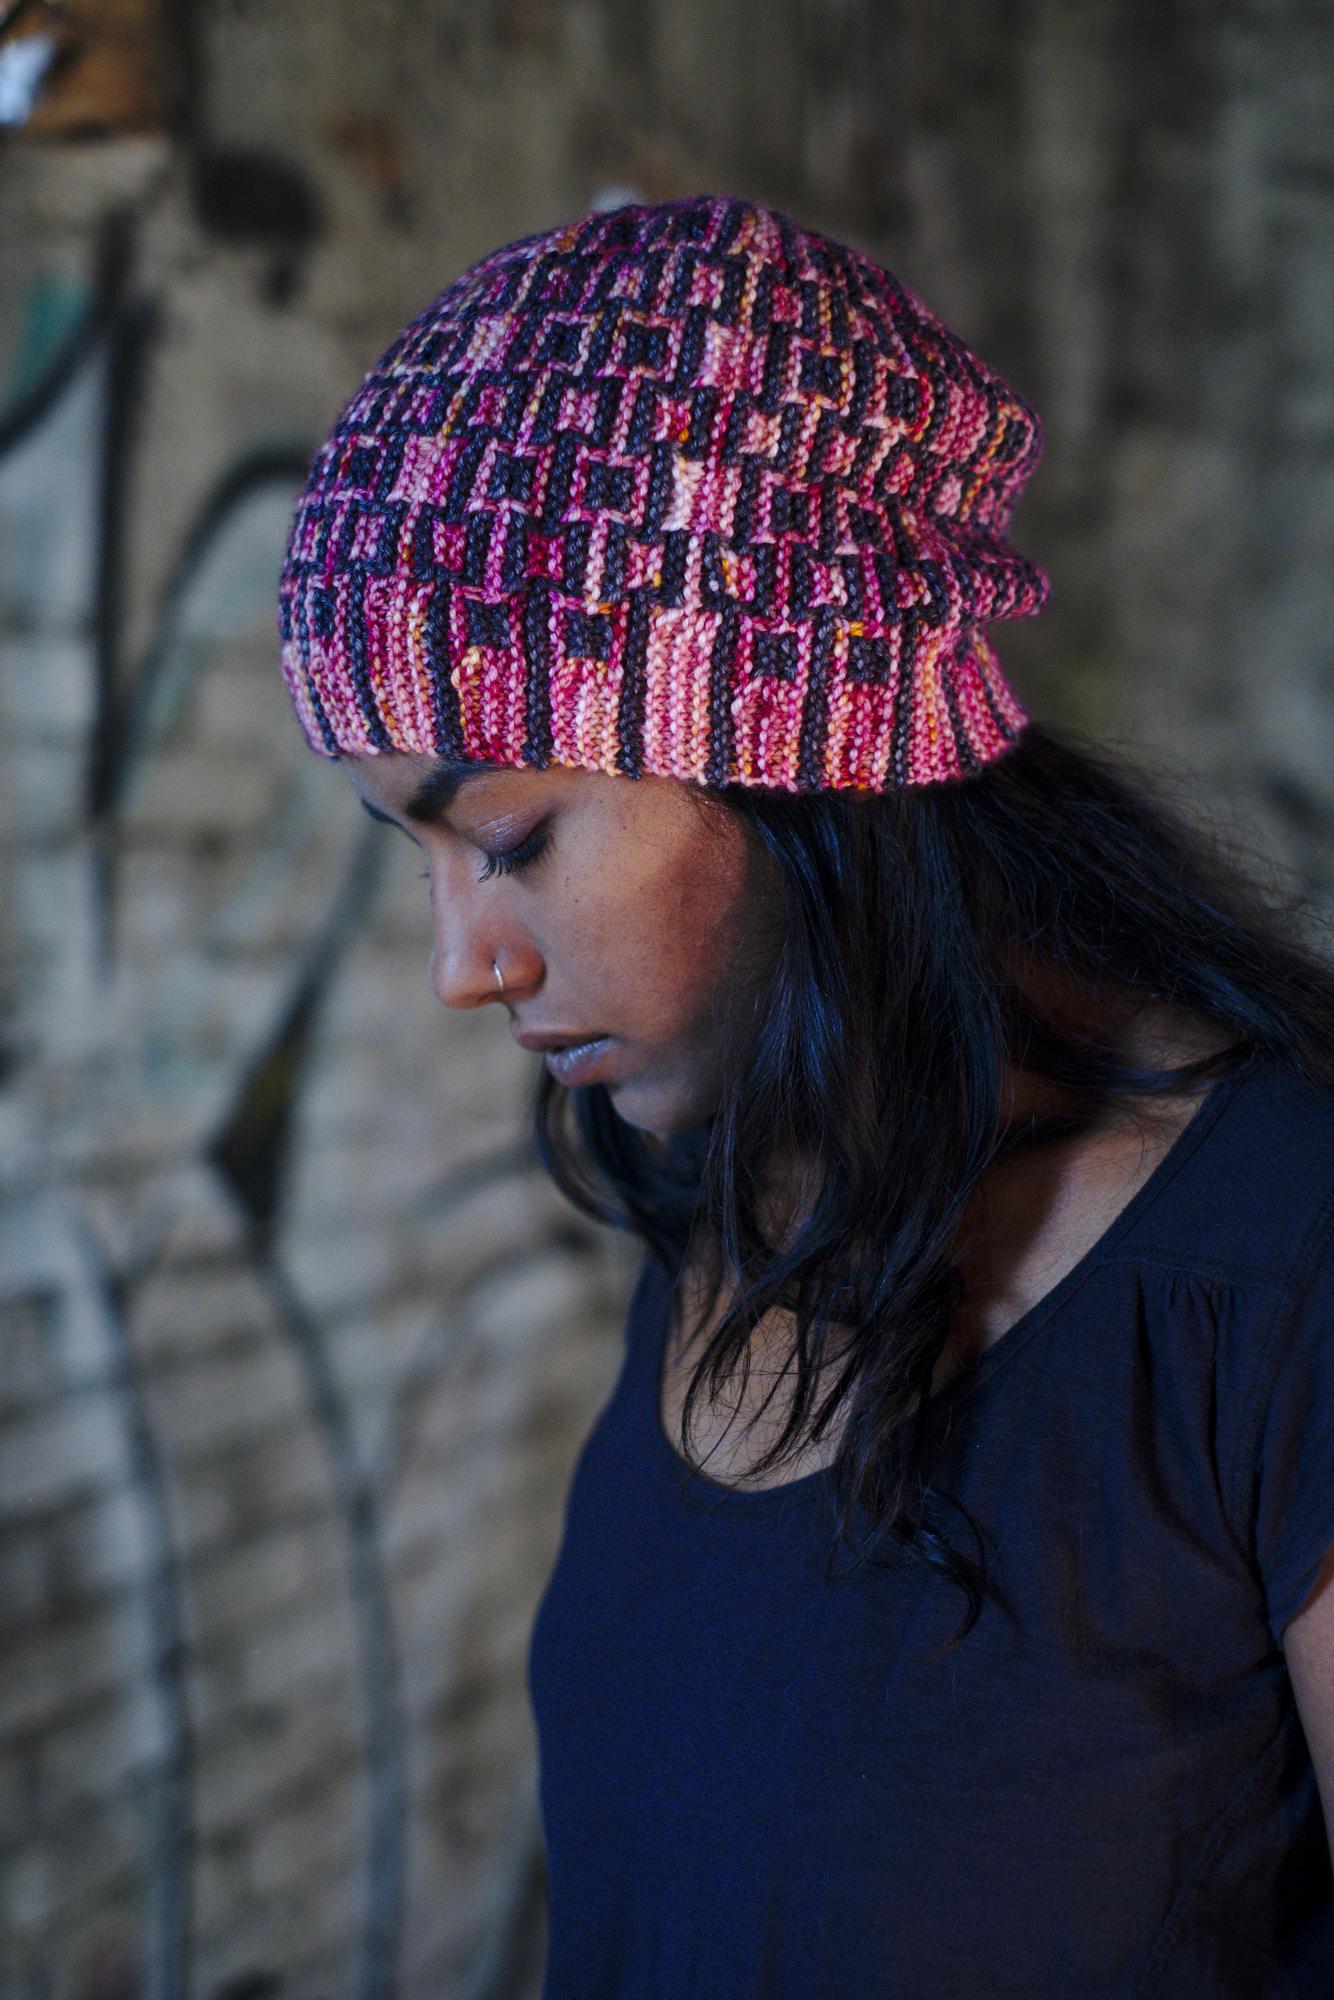 Downtown sideways knit mosaic hat knitting pattern for dk weight yarn